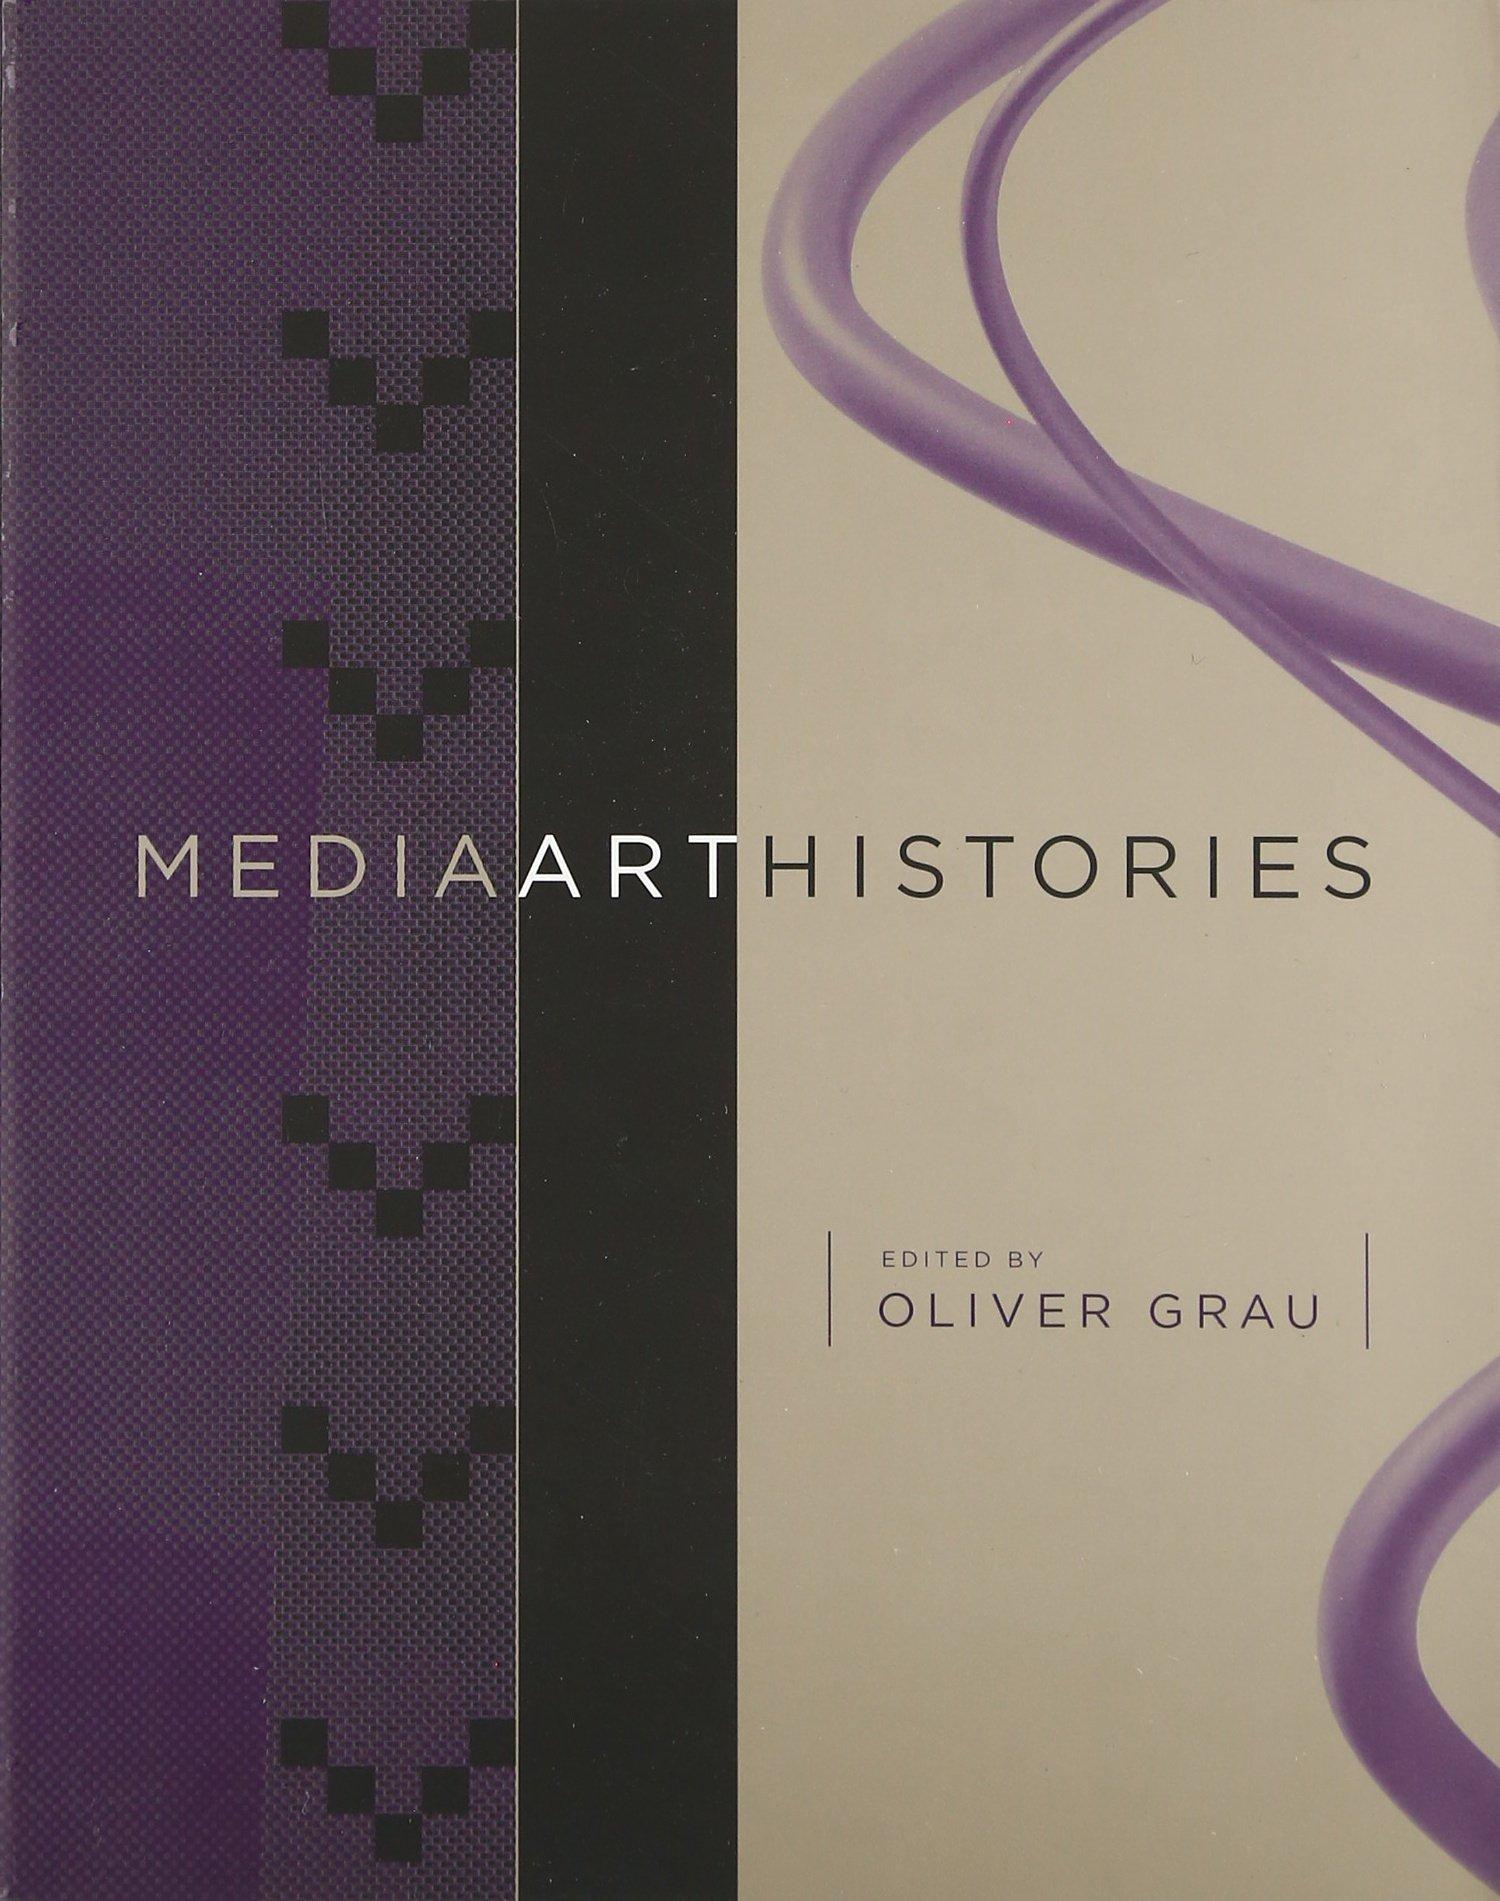 MediaArtHistories (20cfb): Oliver Grau, Roger F. Malina PhD, Sean Cubitt,  Rudolf Arnheim, Andreas Broeckmann, Ron Burnett, Edmond Couchot, Dieter  Daniels, ...